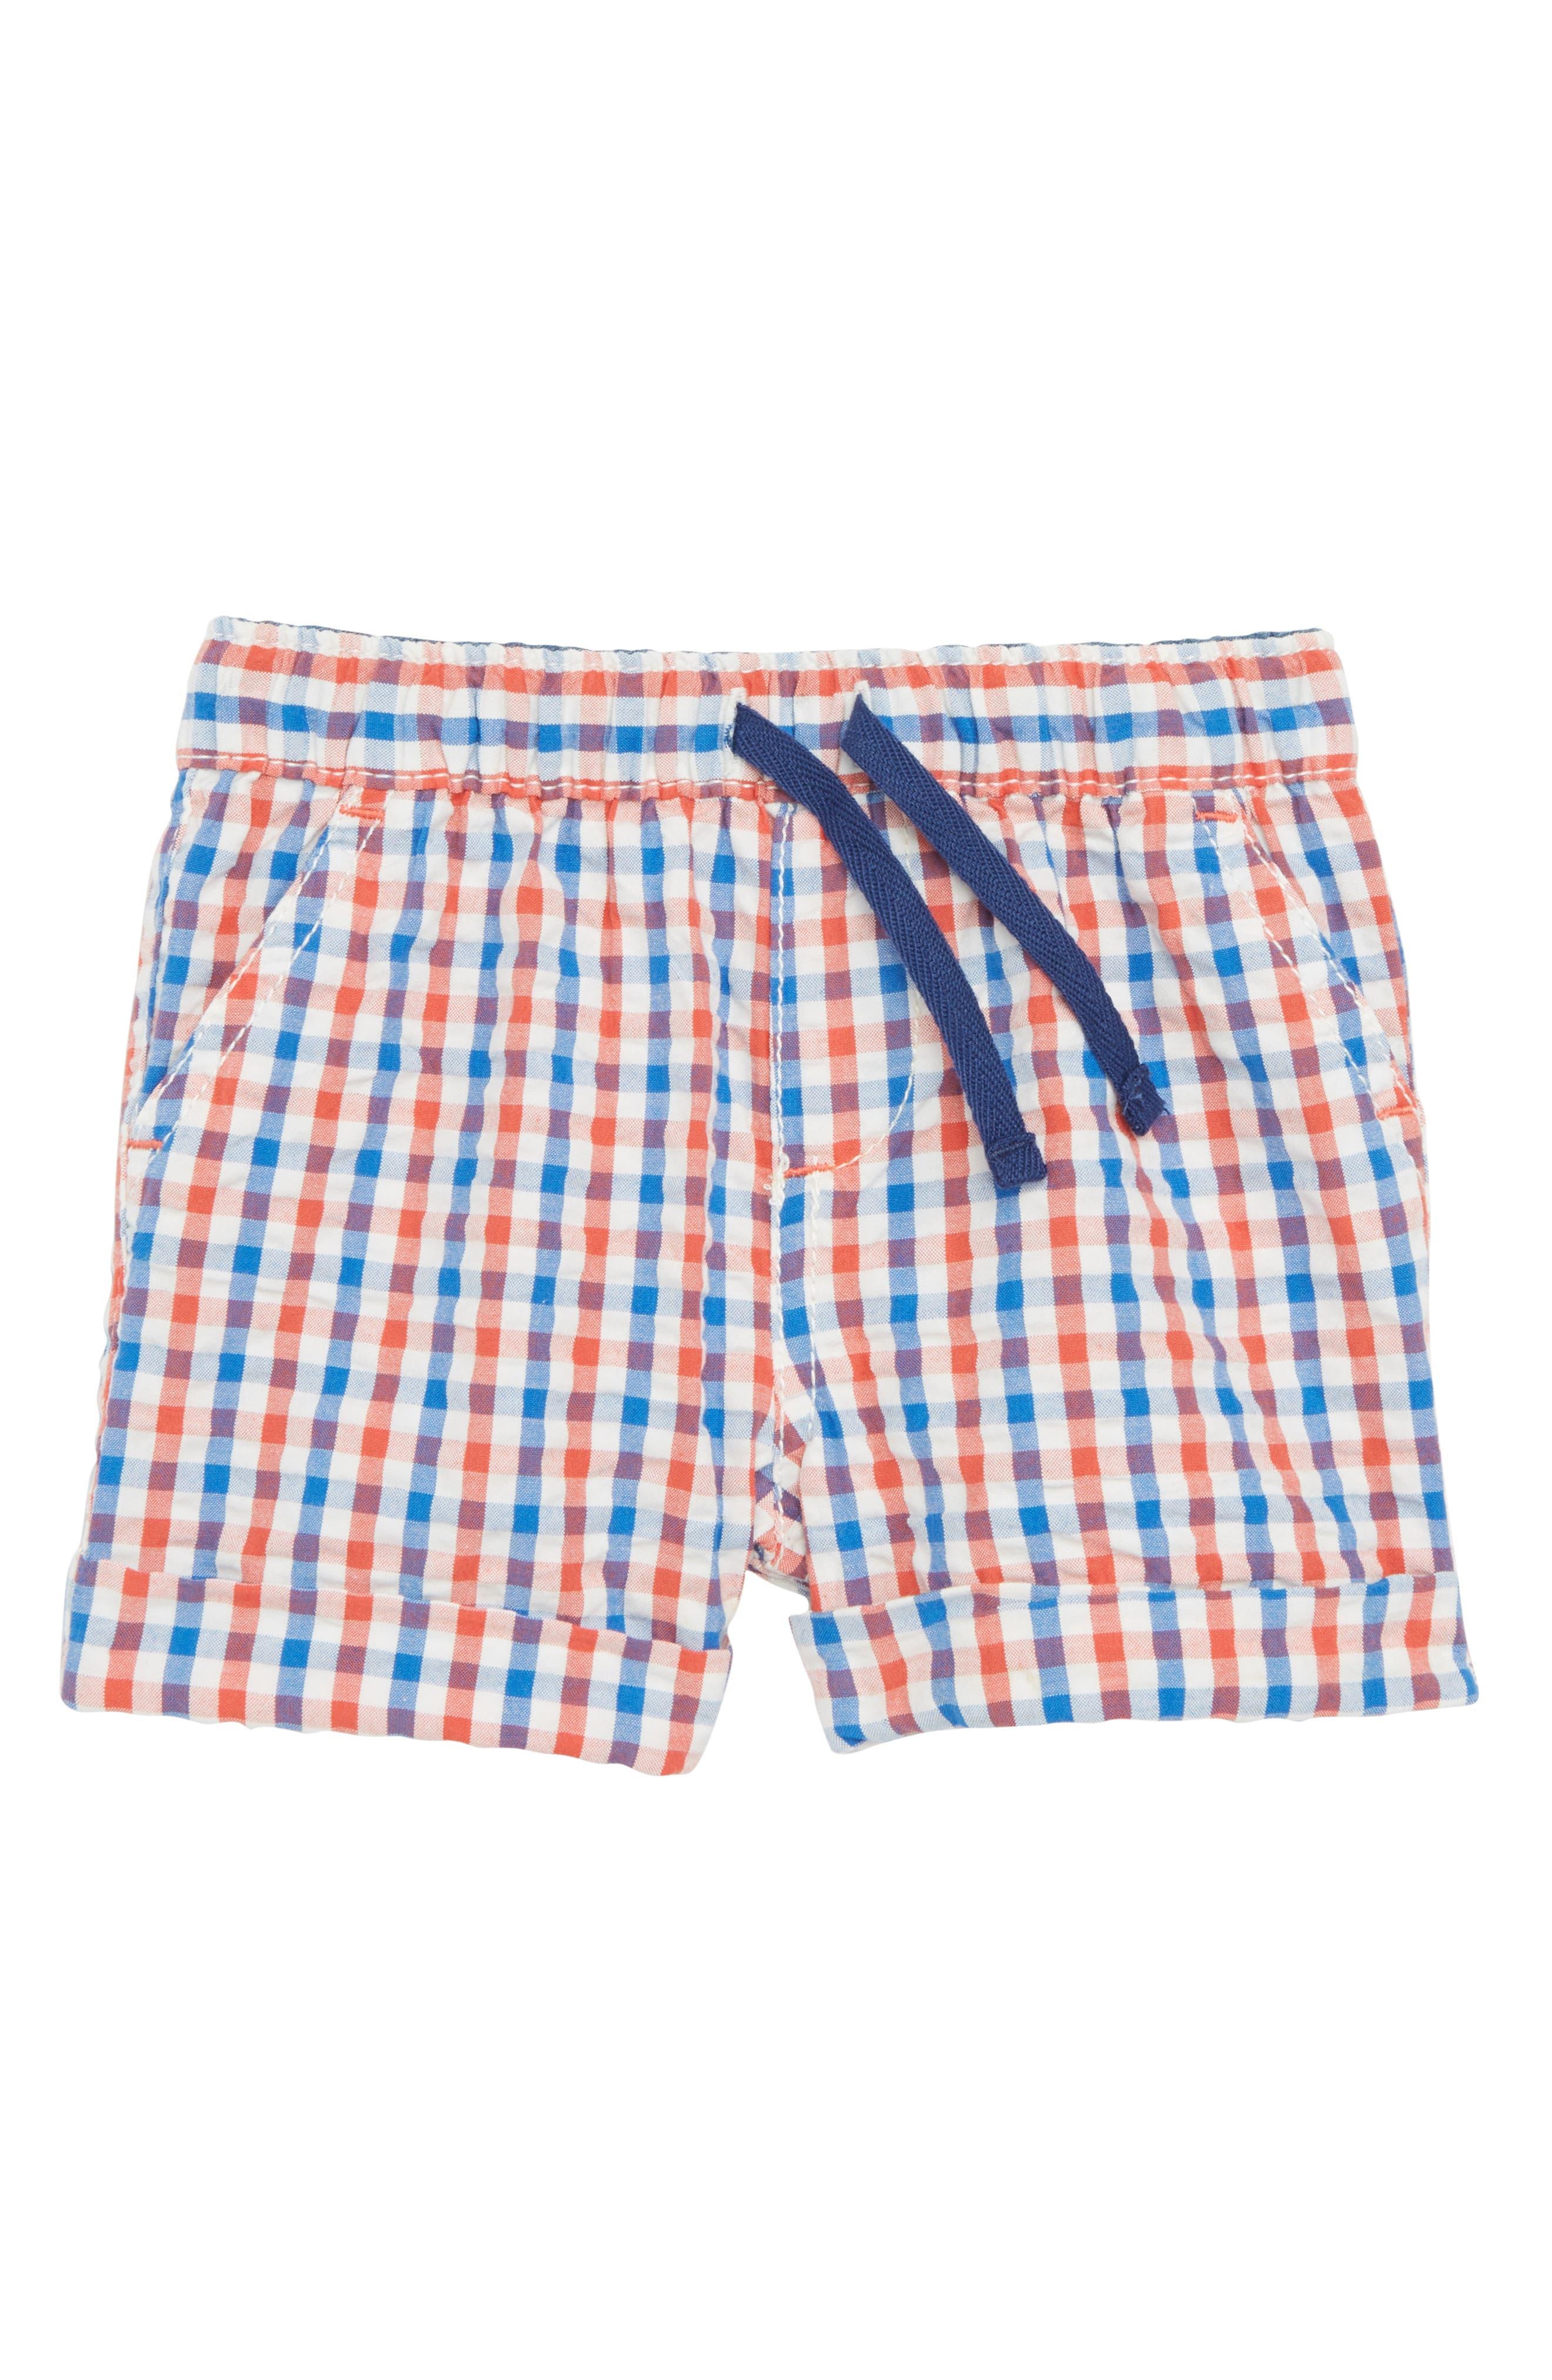 Explorer Gingham Shorts,                         Main,                         color, Soft Red/ Skipper Blue Check